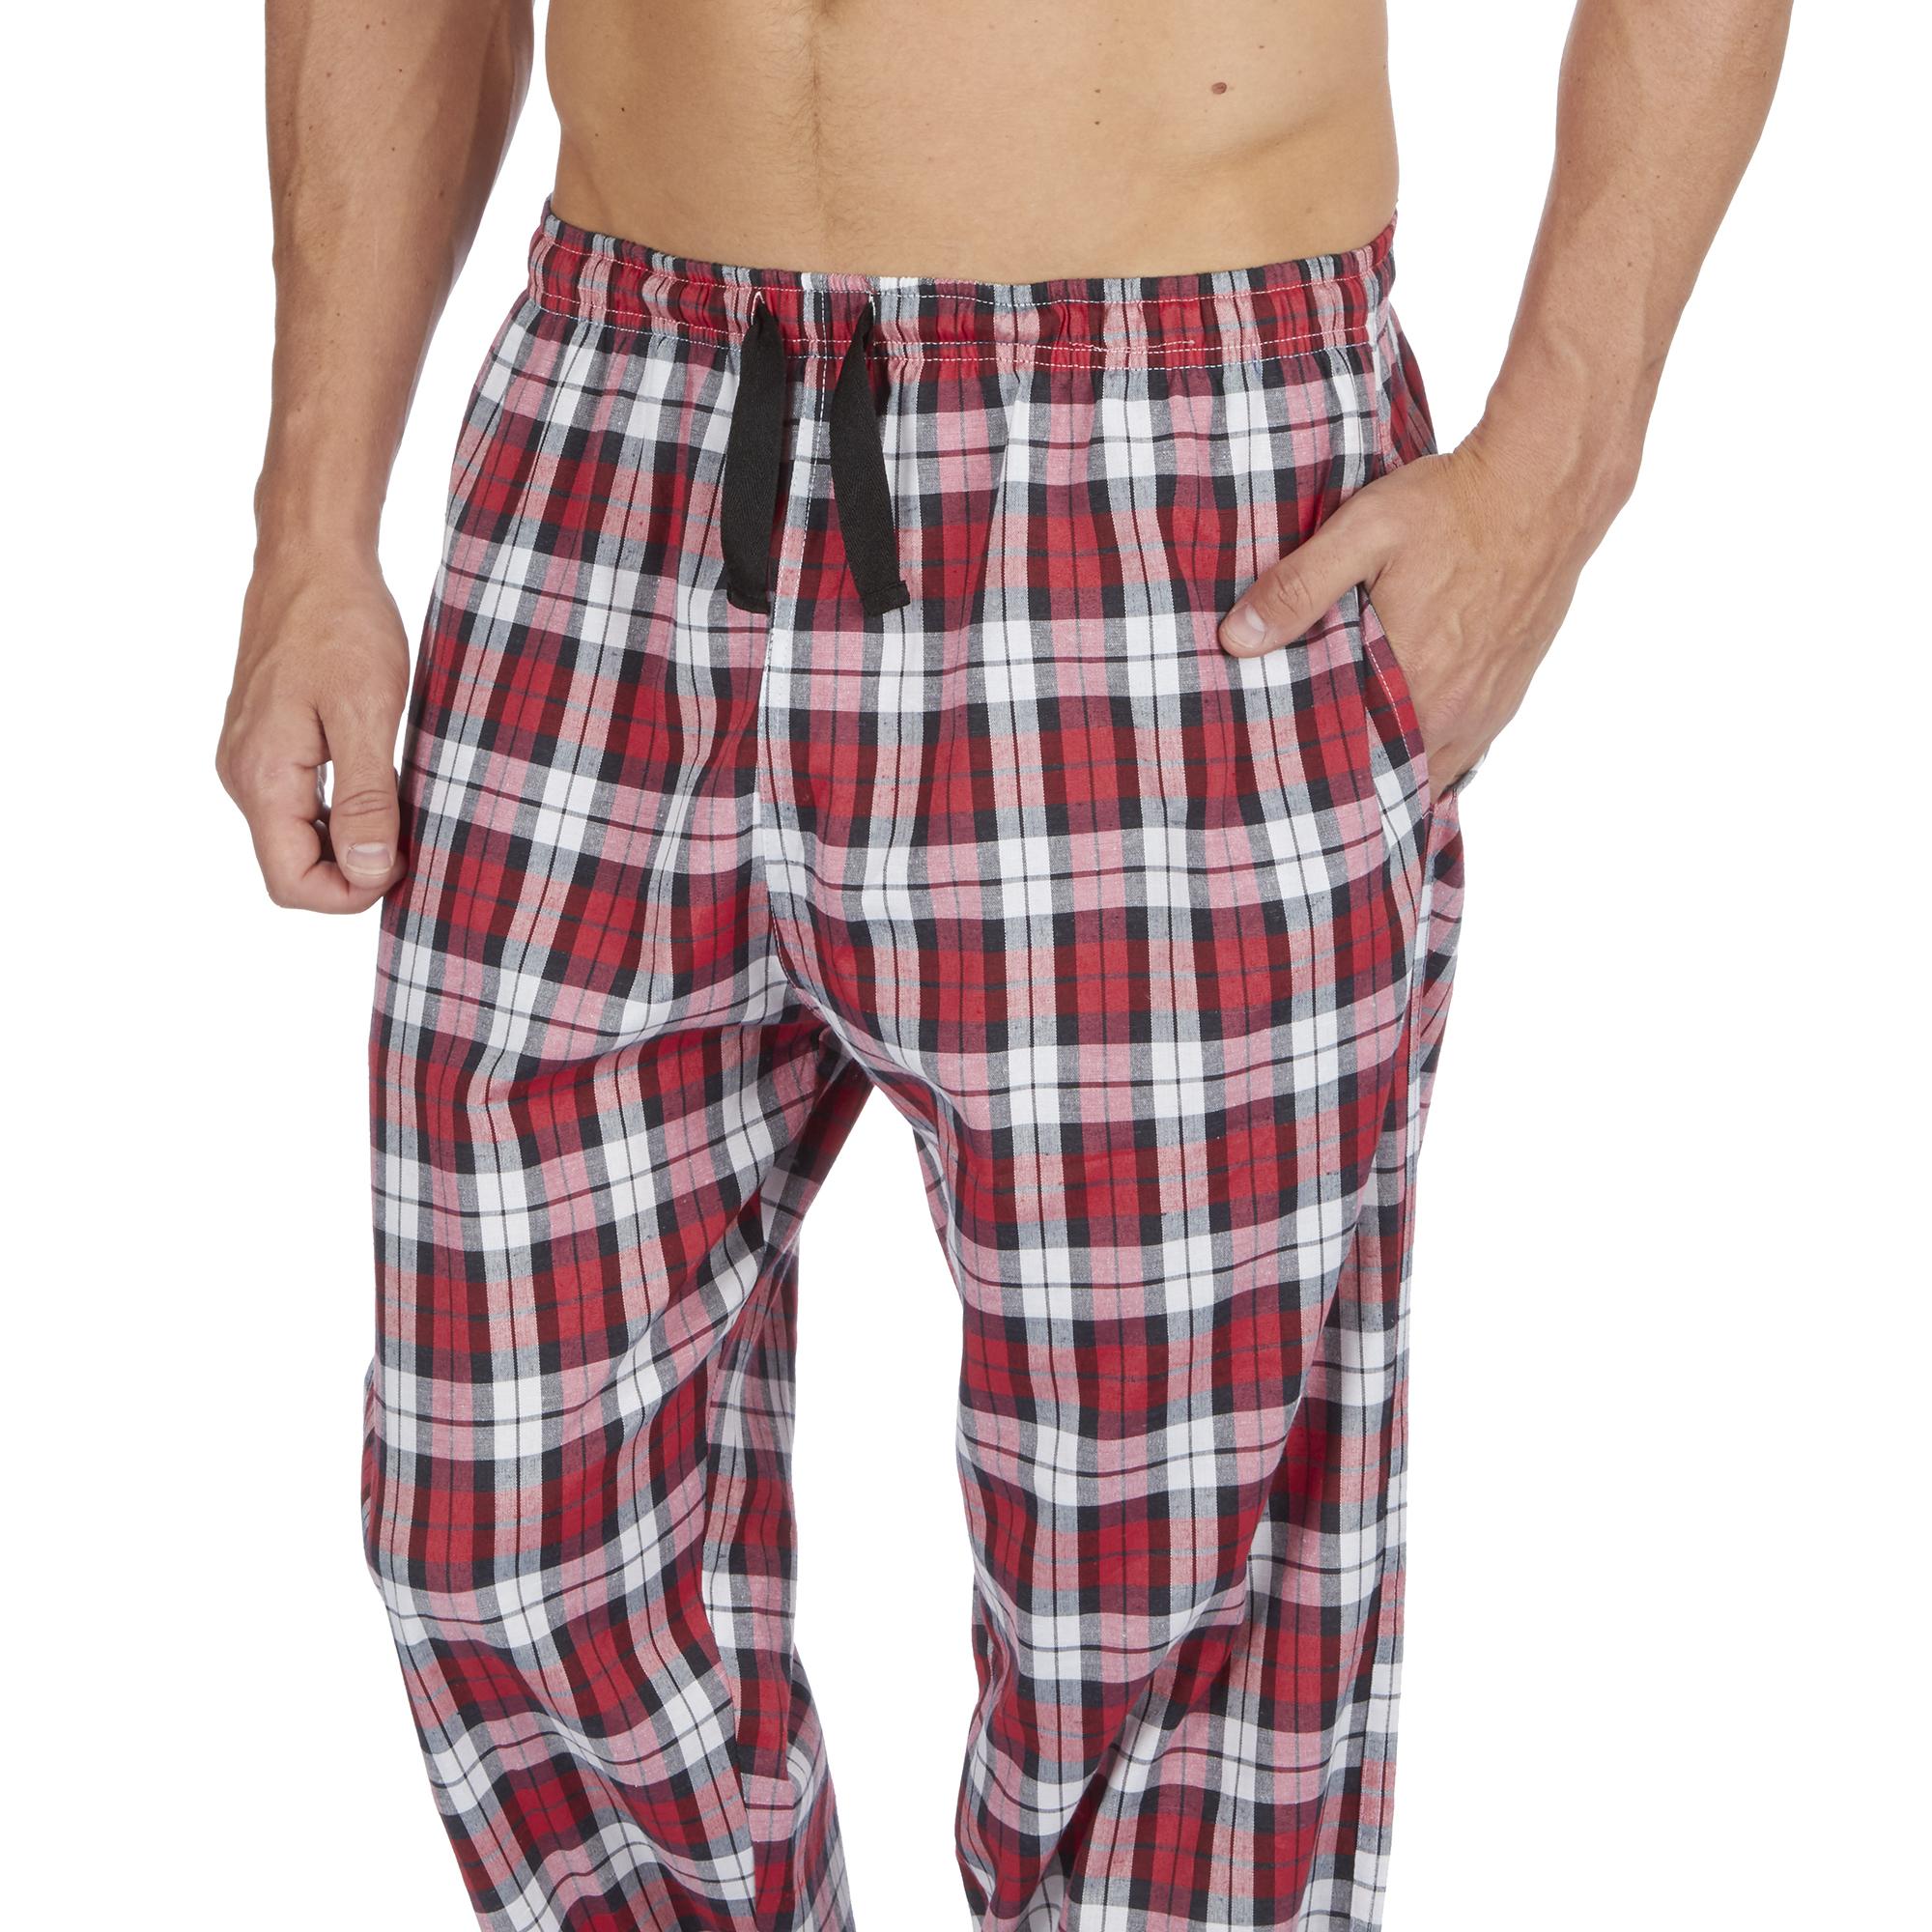 JASON JONES Mens Woven Lounge Bed Pants Pyjama Bottoms Checked Trousers Twill PJ Cotton Blend Comfortable Elasticated Waist Nightwear S-XXL